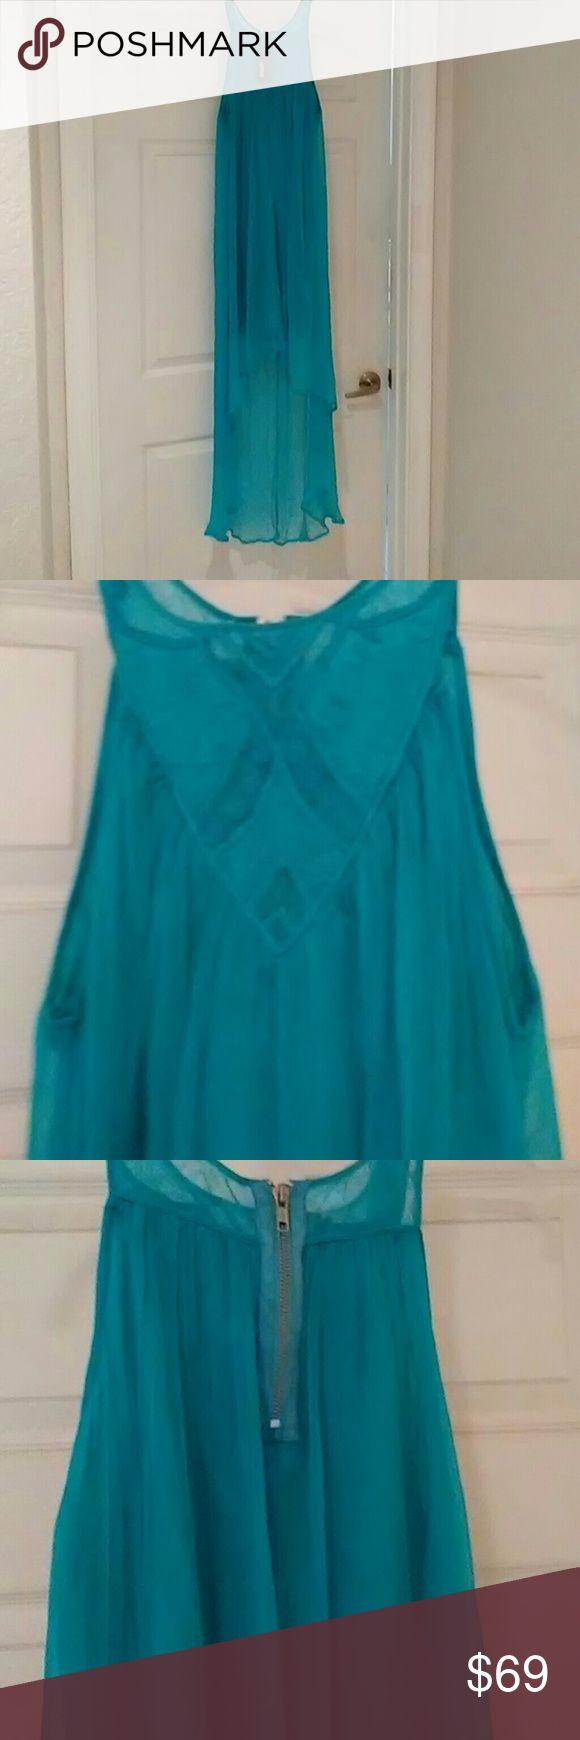 Beautiful turquoise maxi high low dress by Buffalo Turquoise maxi dress, high low very attractive. Buffalo David Bitton Dresses High Low